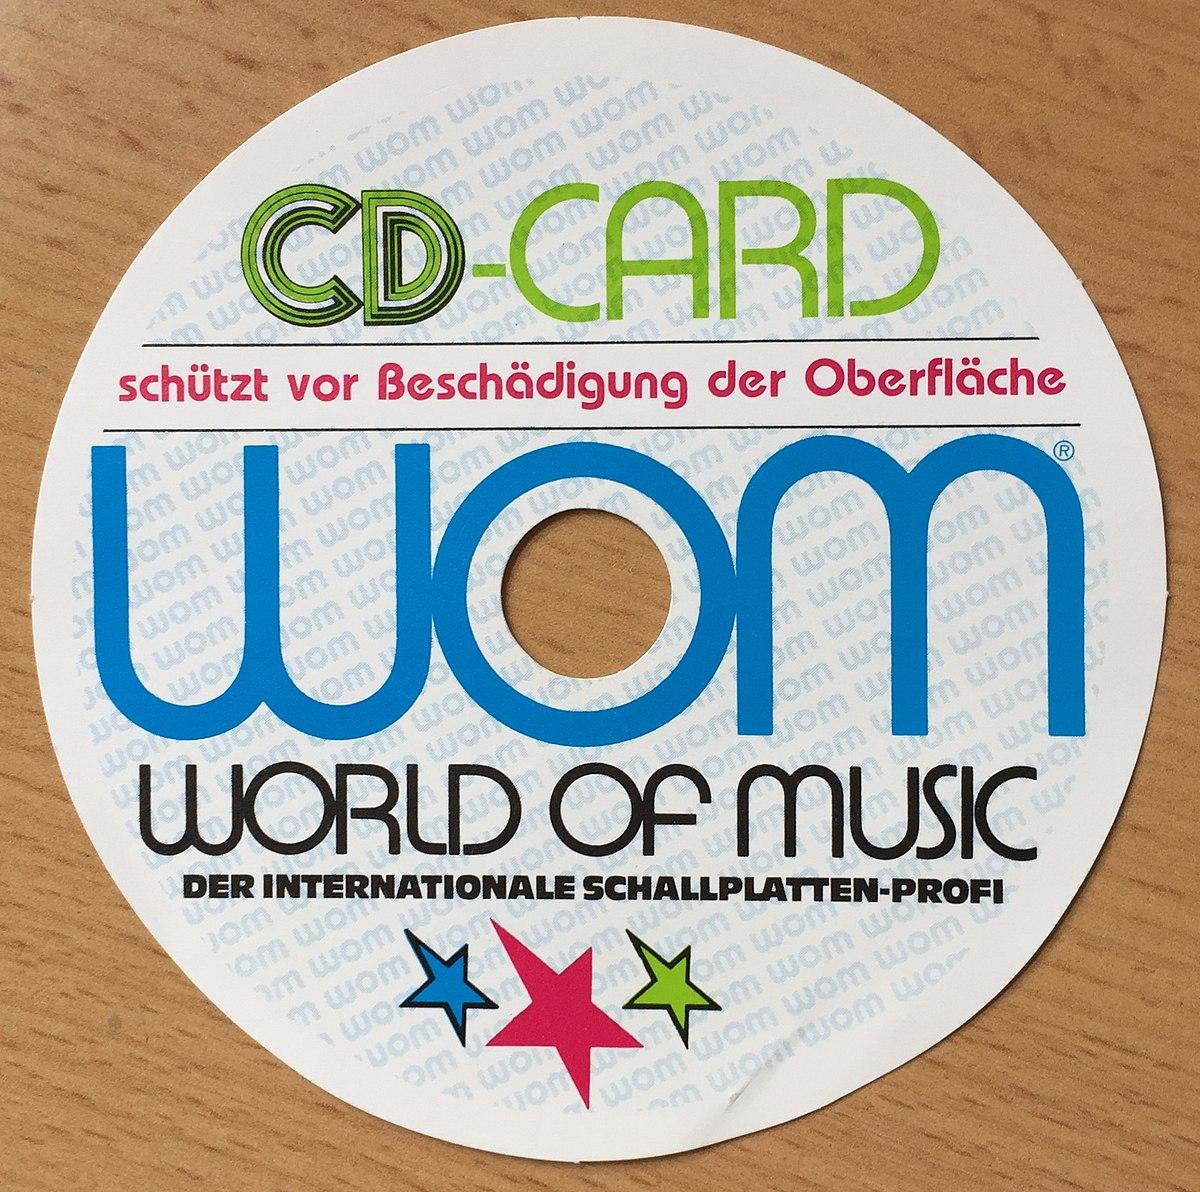 WOM CD-Card.jpg